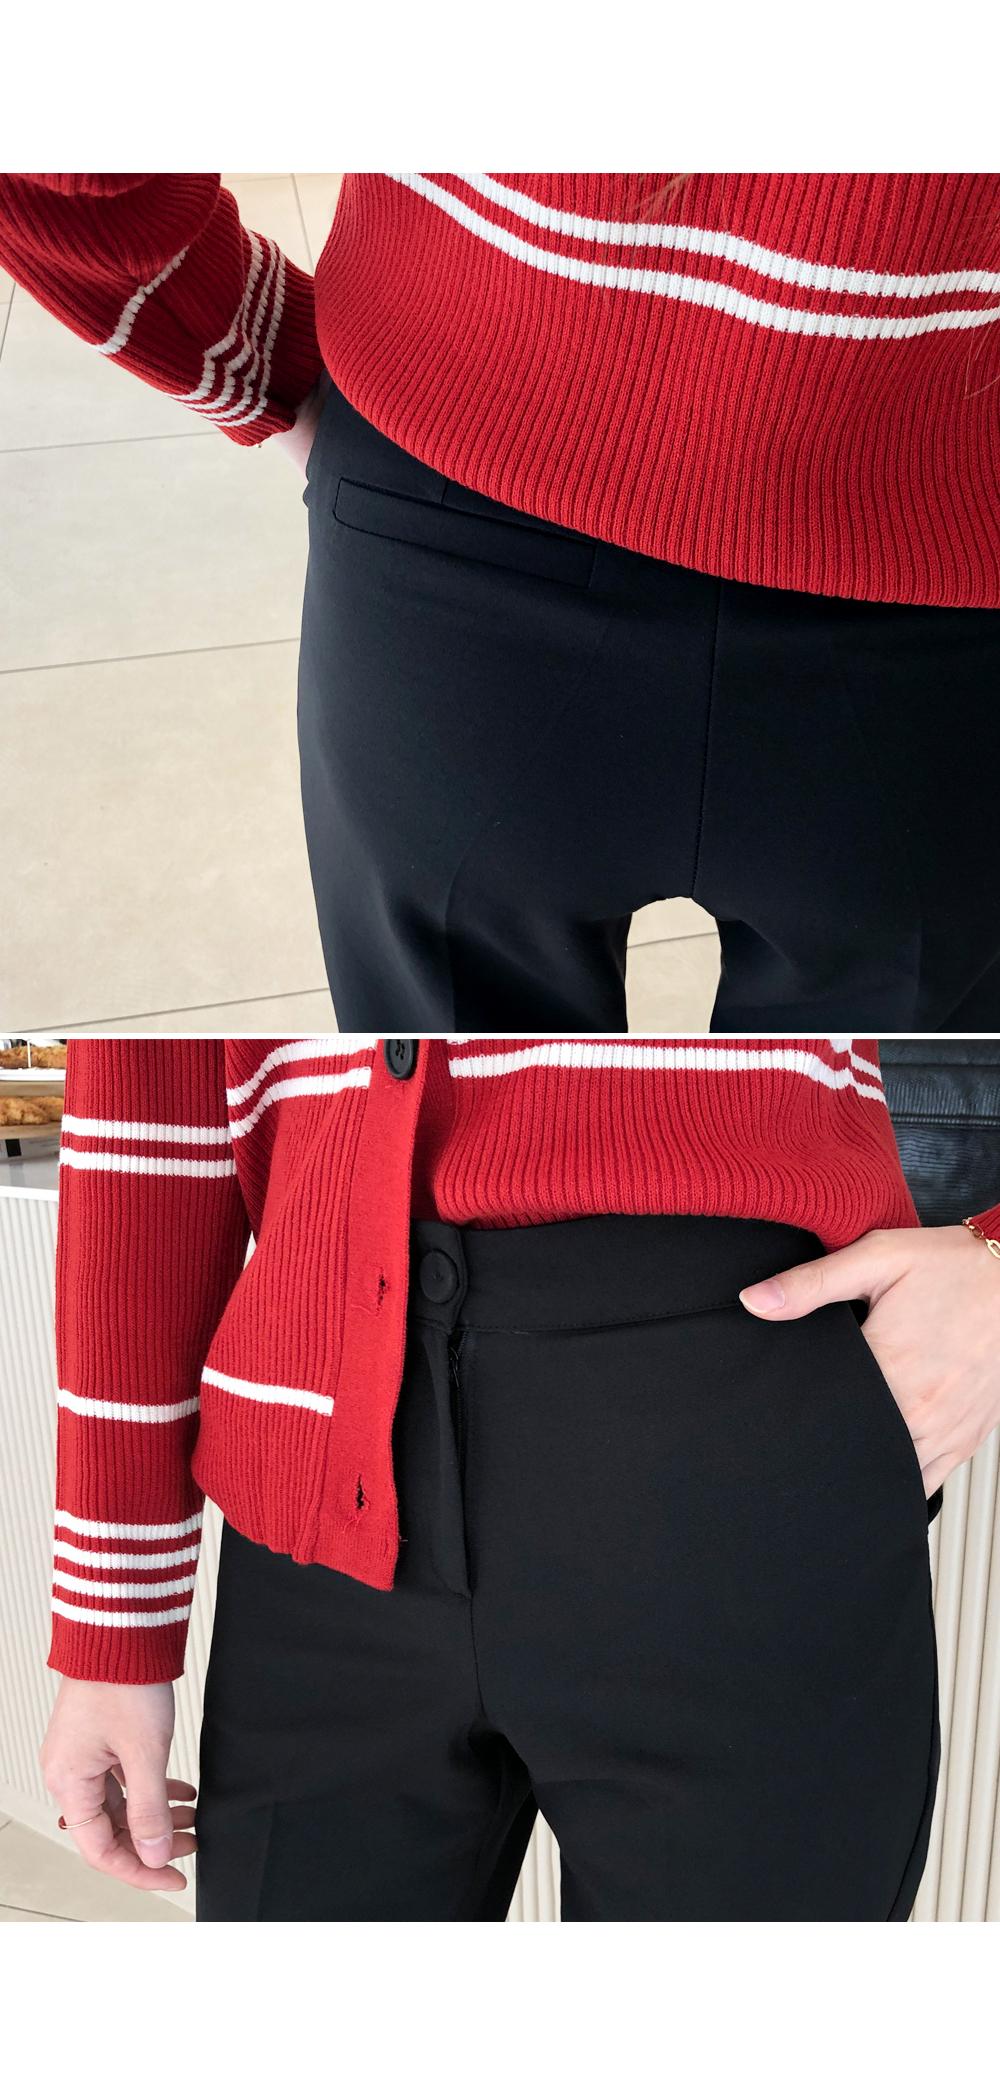 Slim Wide Fit Slacks